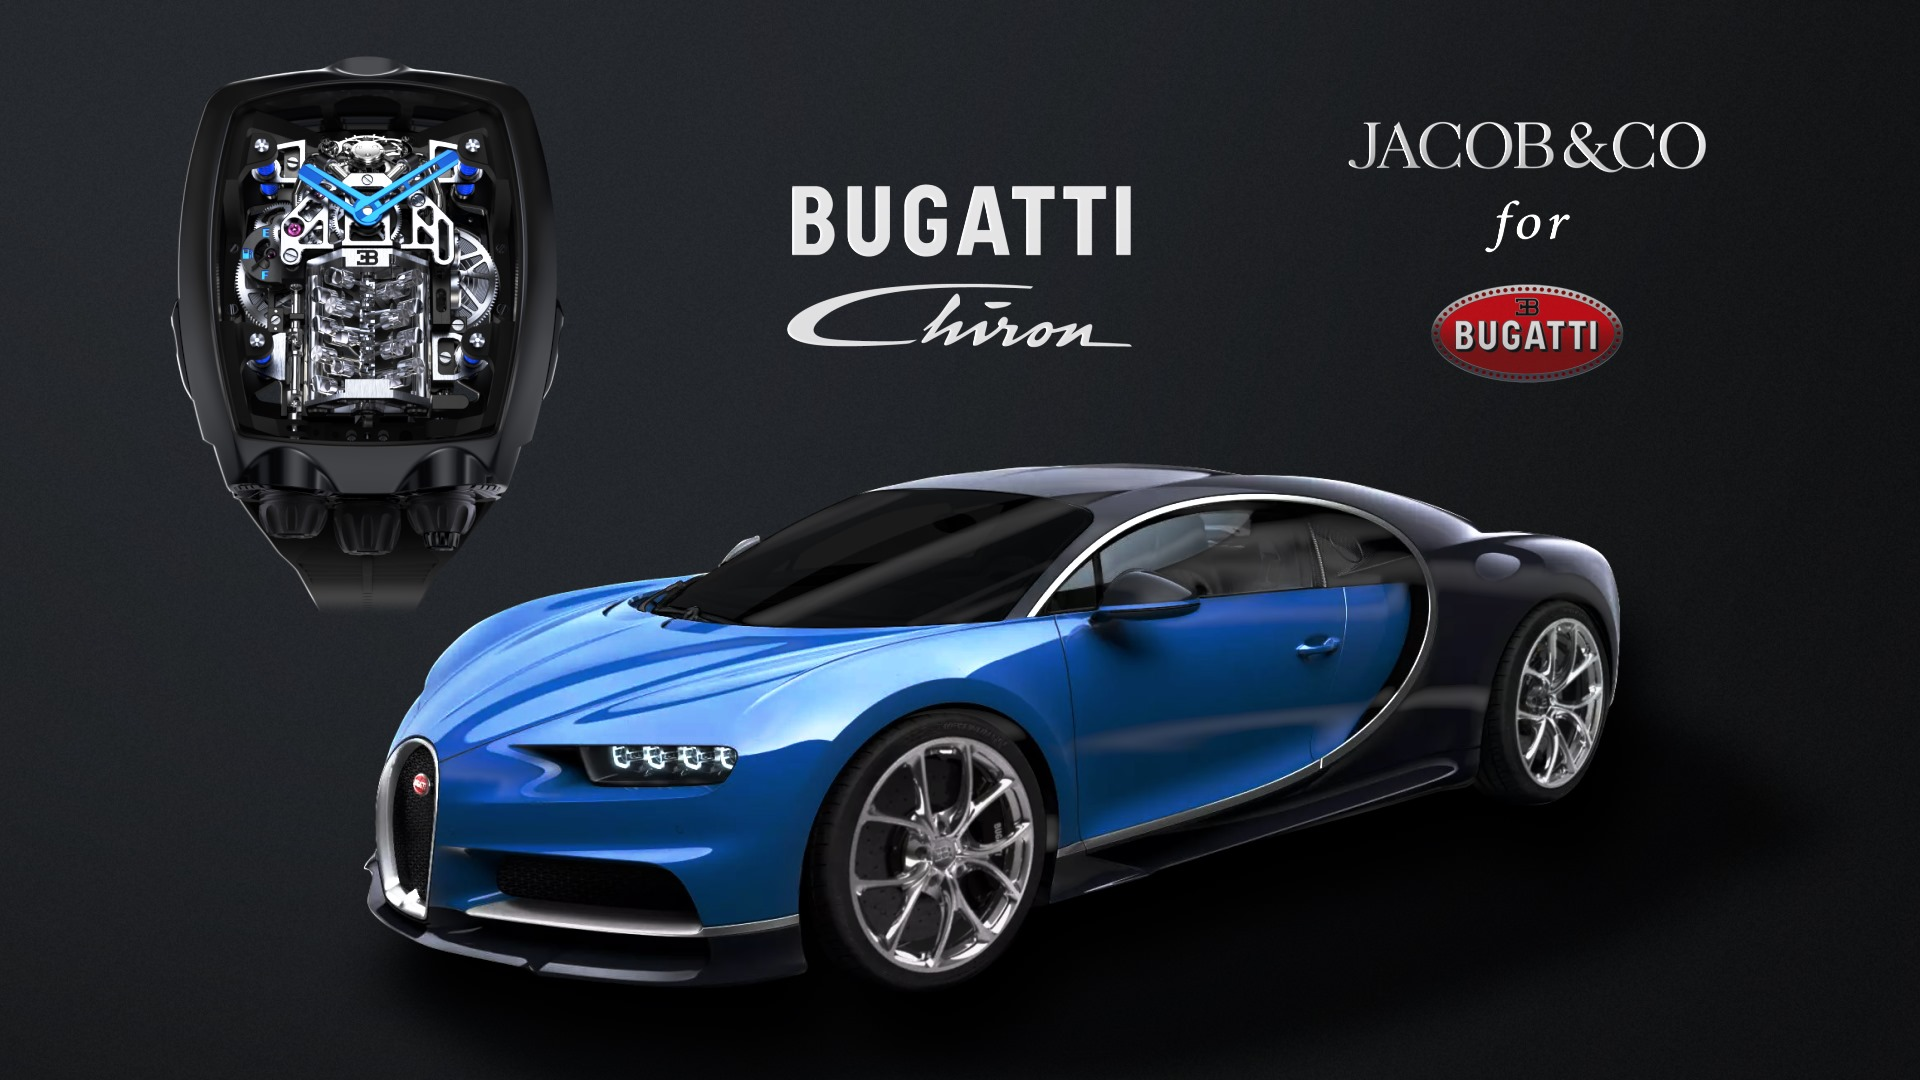 1_Jacob-Co-Bugatti-Chiron-Tourbillon-1